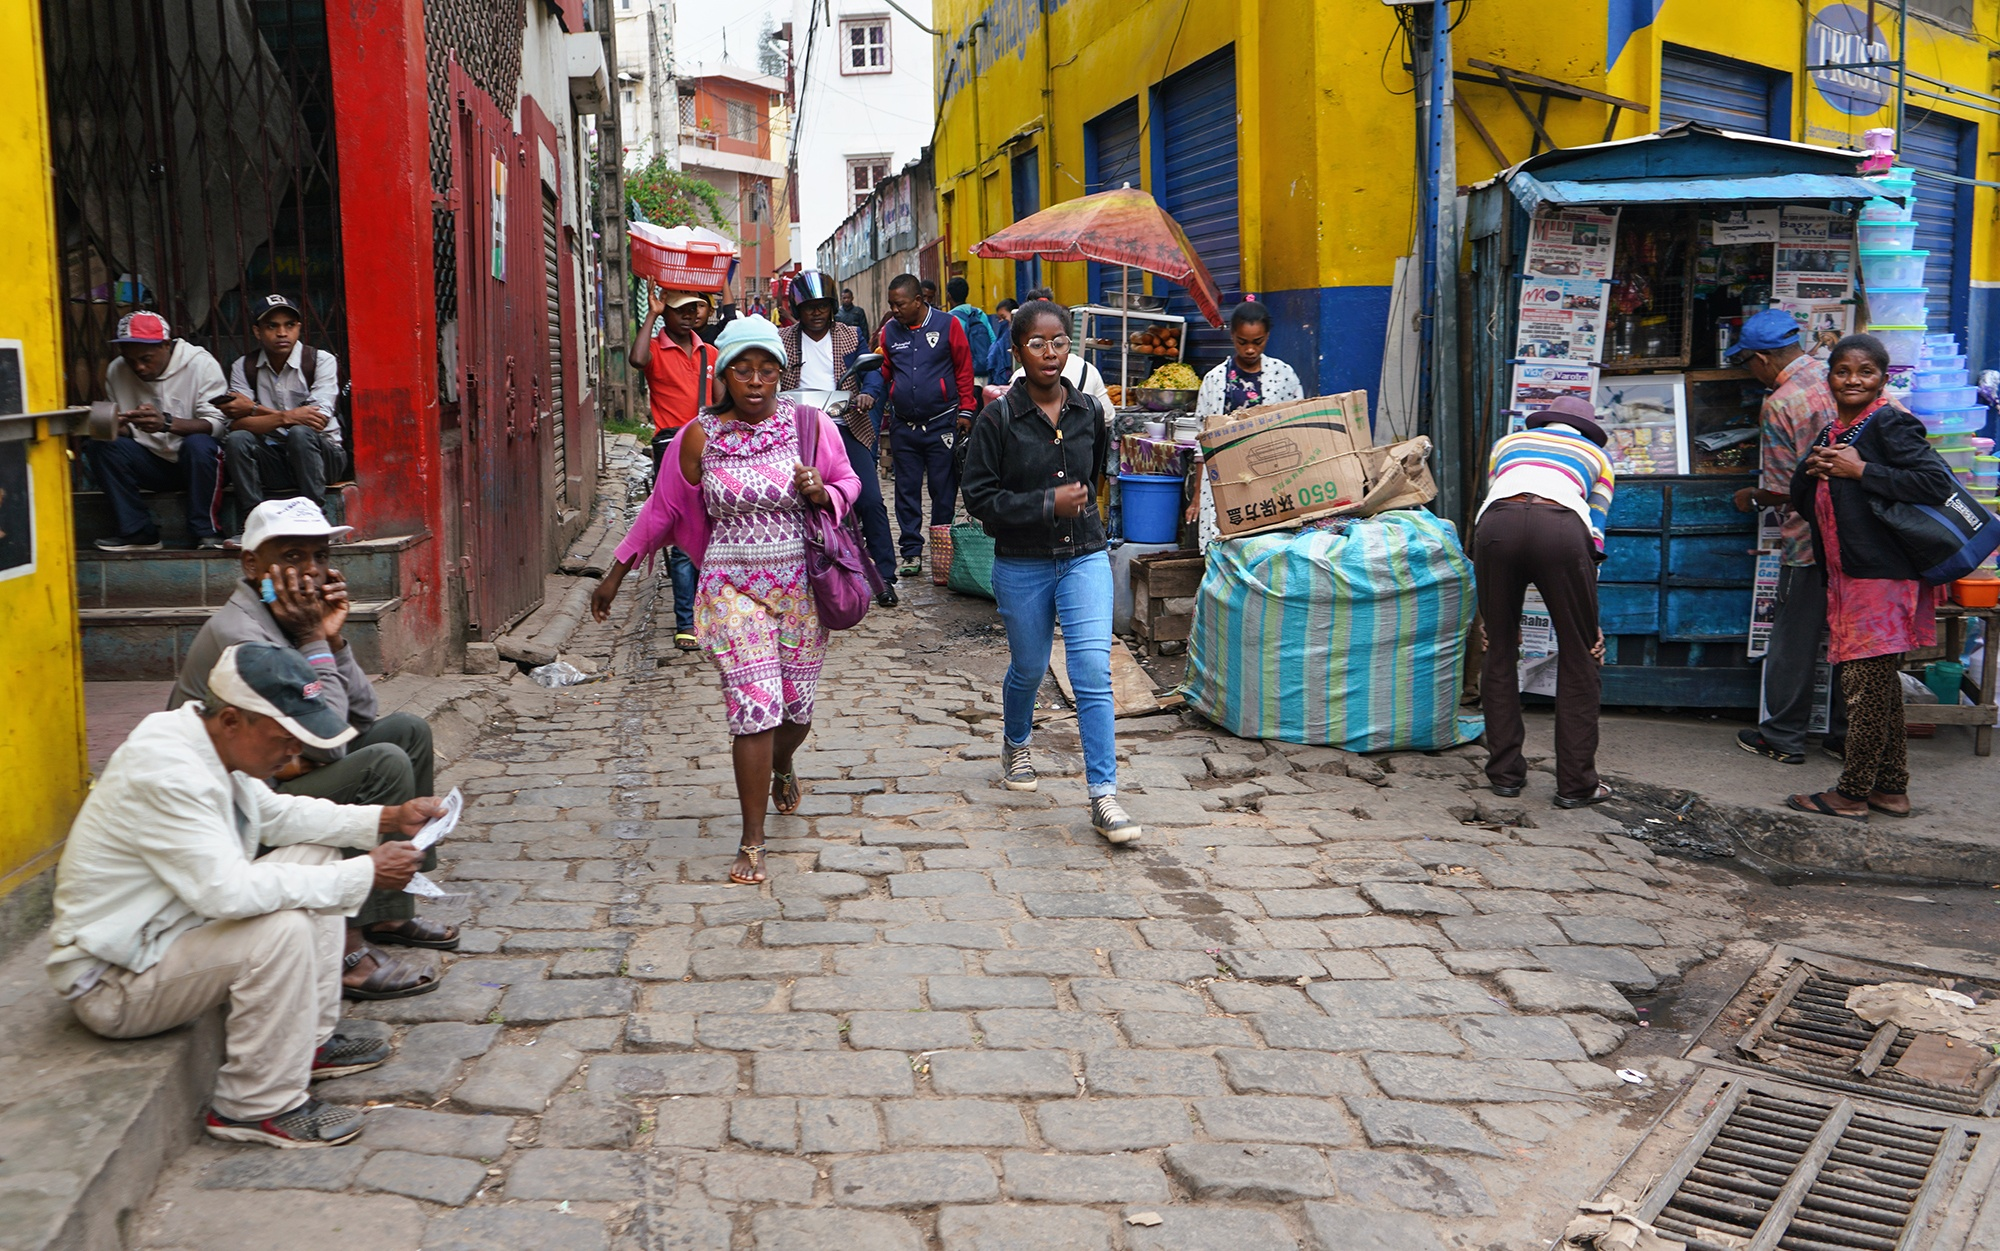 Rue Madagascar